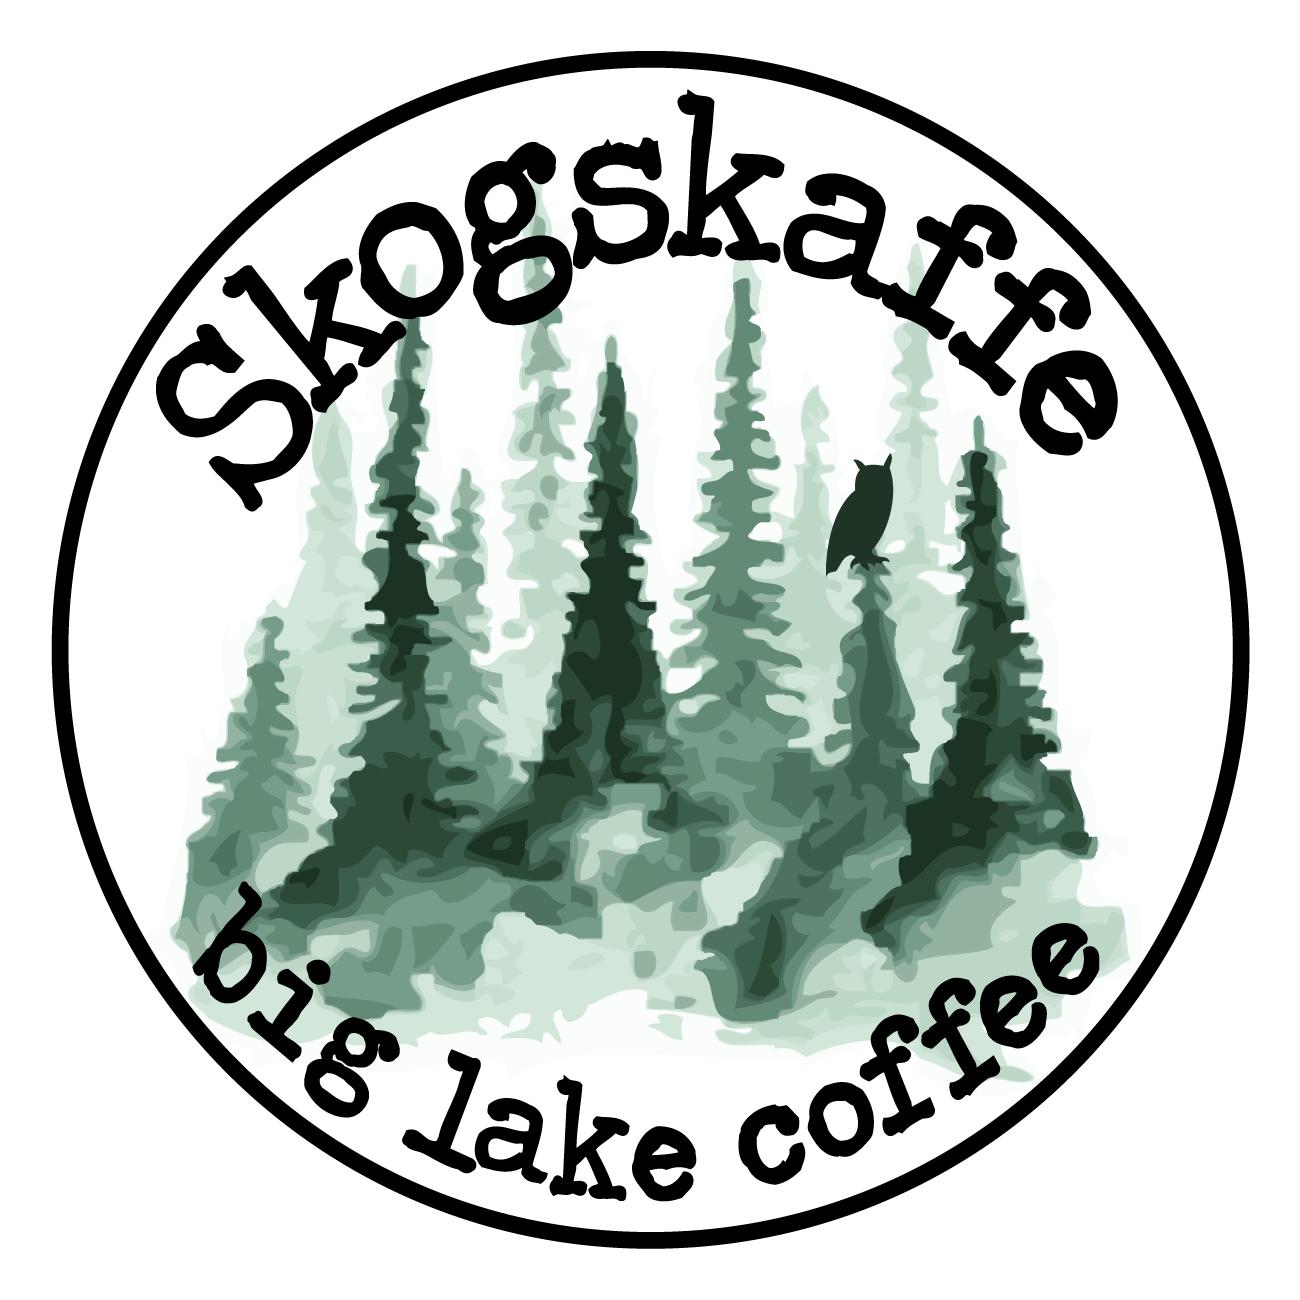 Skogskaffe: Artisan Forest coffee